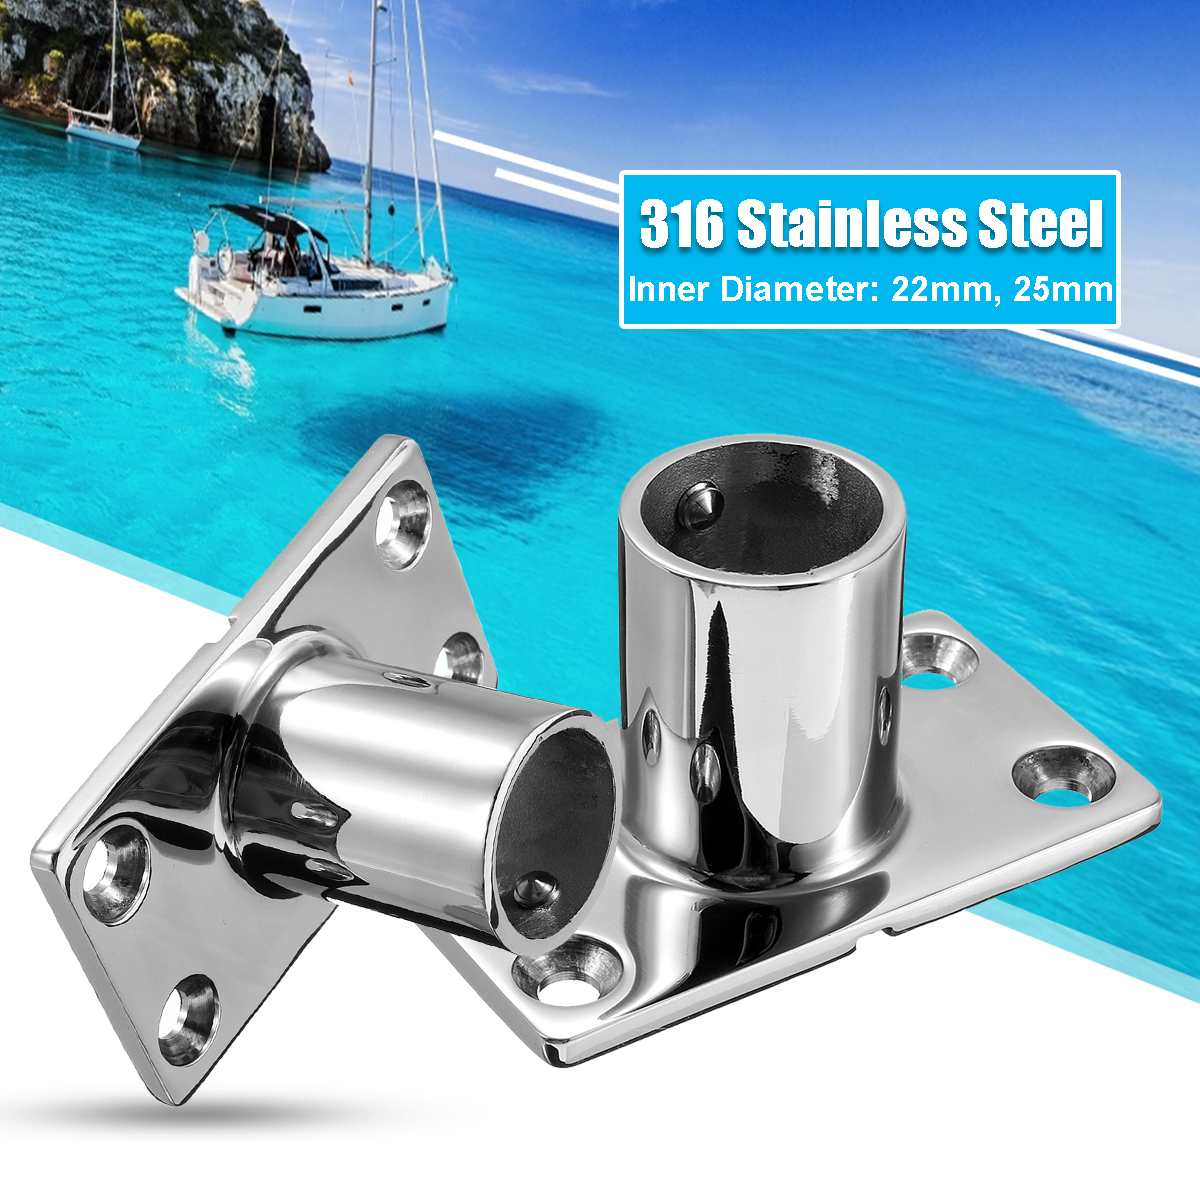 316 Stainless Steel Boat Tube Pipe Base Marine Boat 90° Railing Handrail Fitting Rails Pipe Base Reusable Marine Hardware